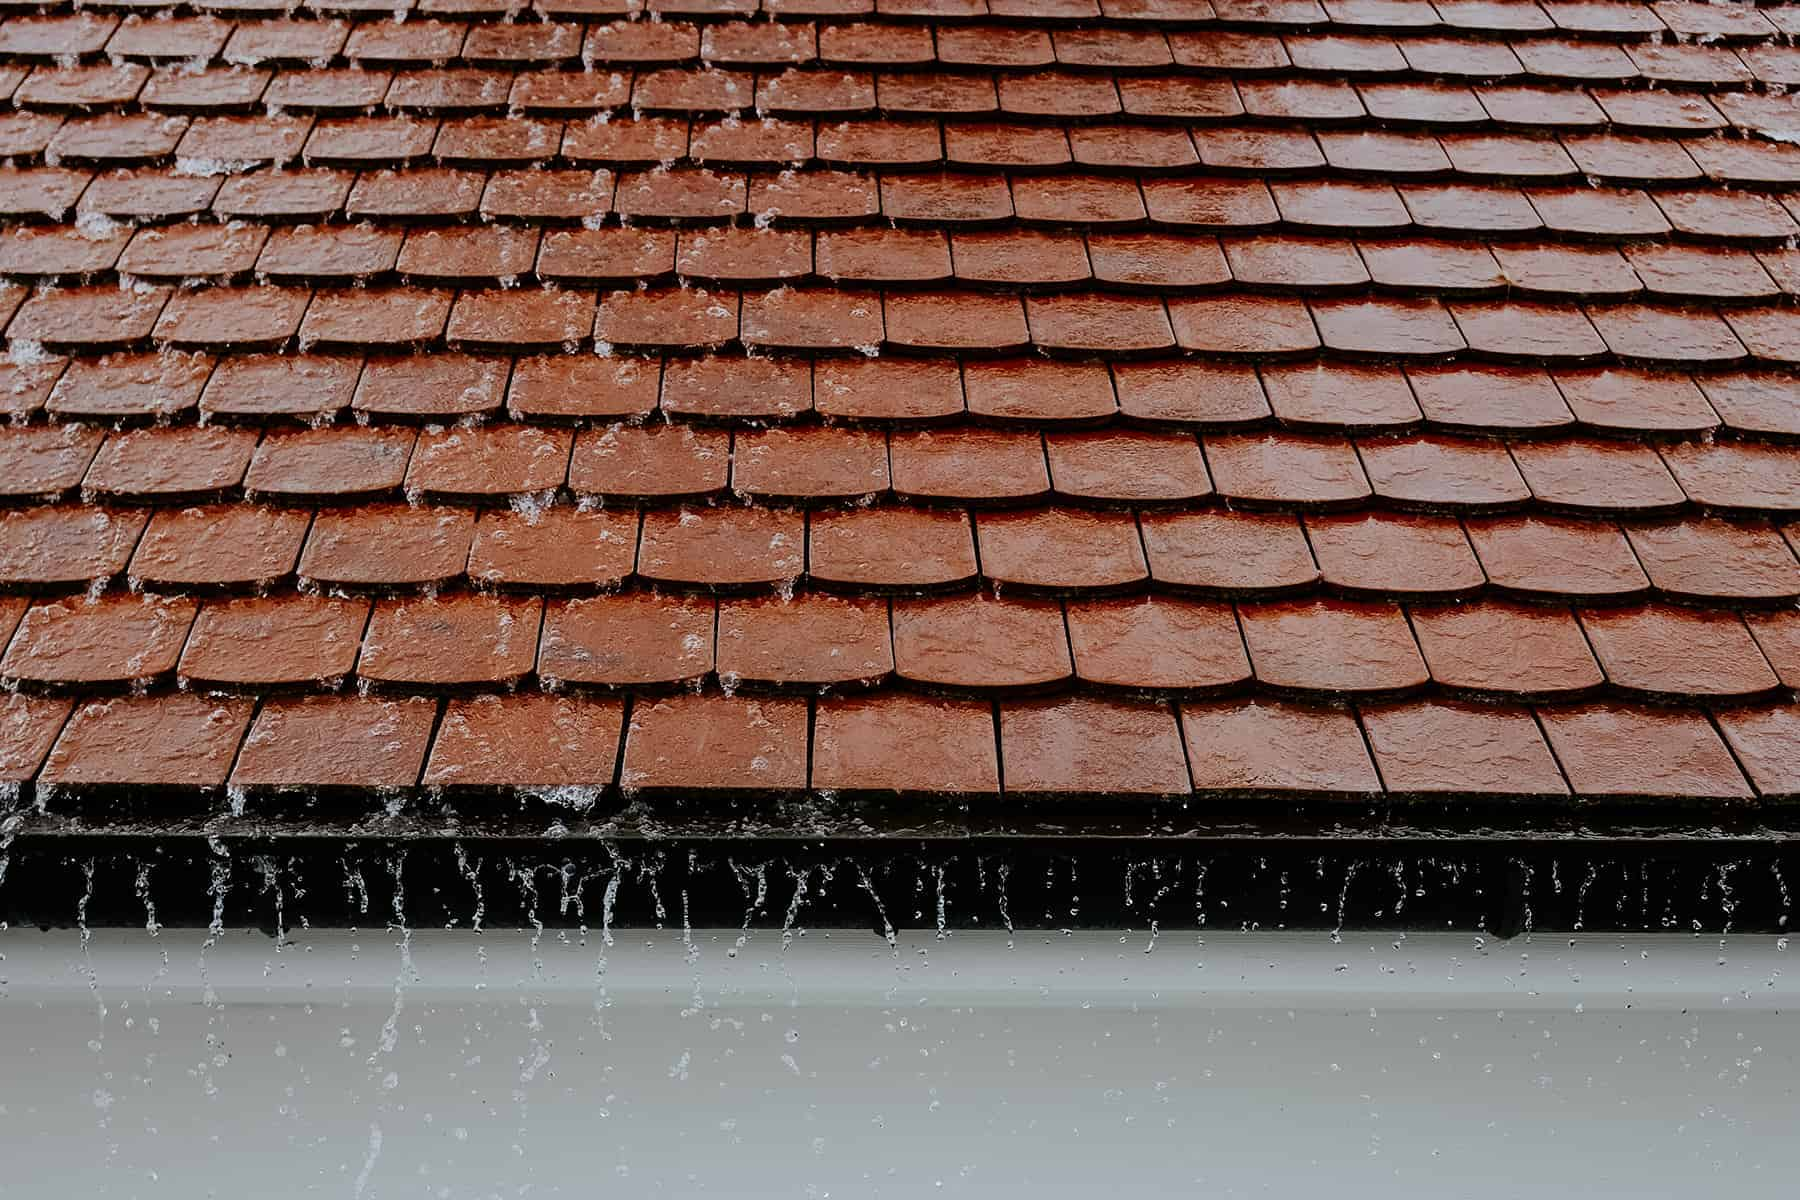 протечки вентиляции крыши во время сильного дождя